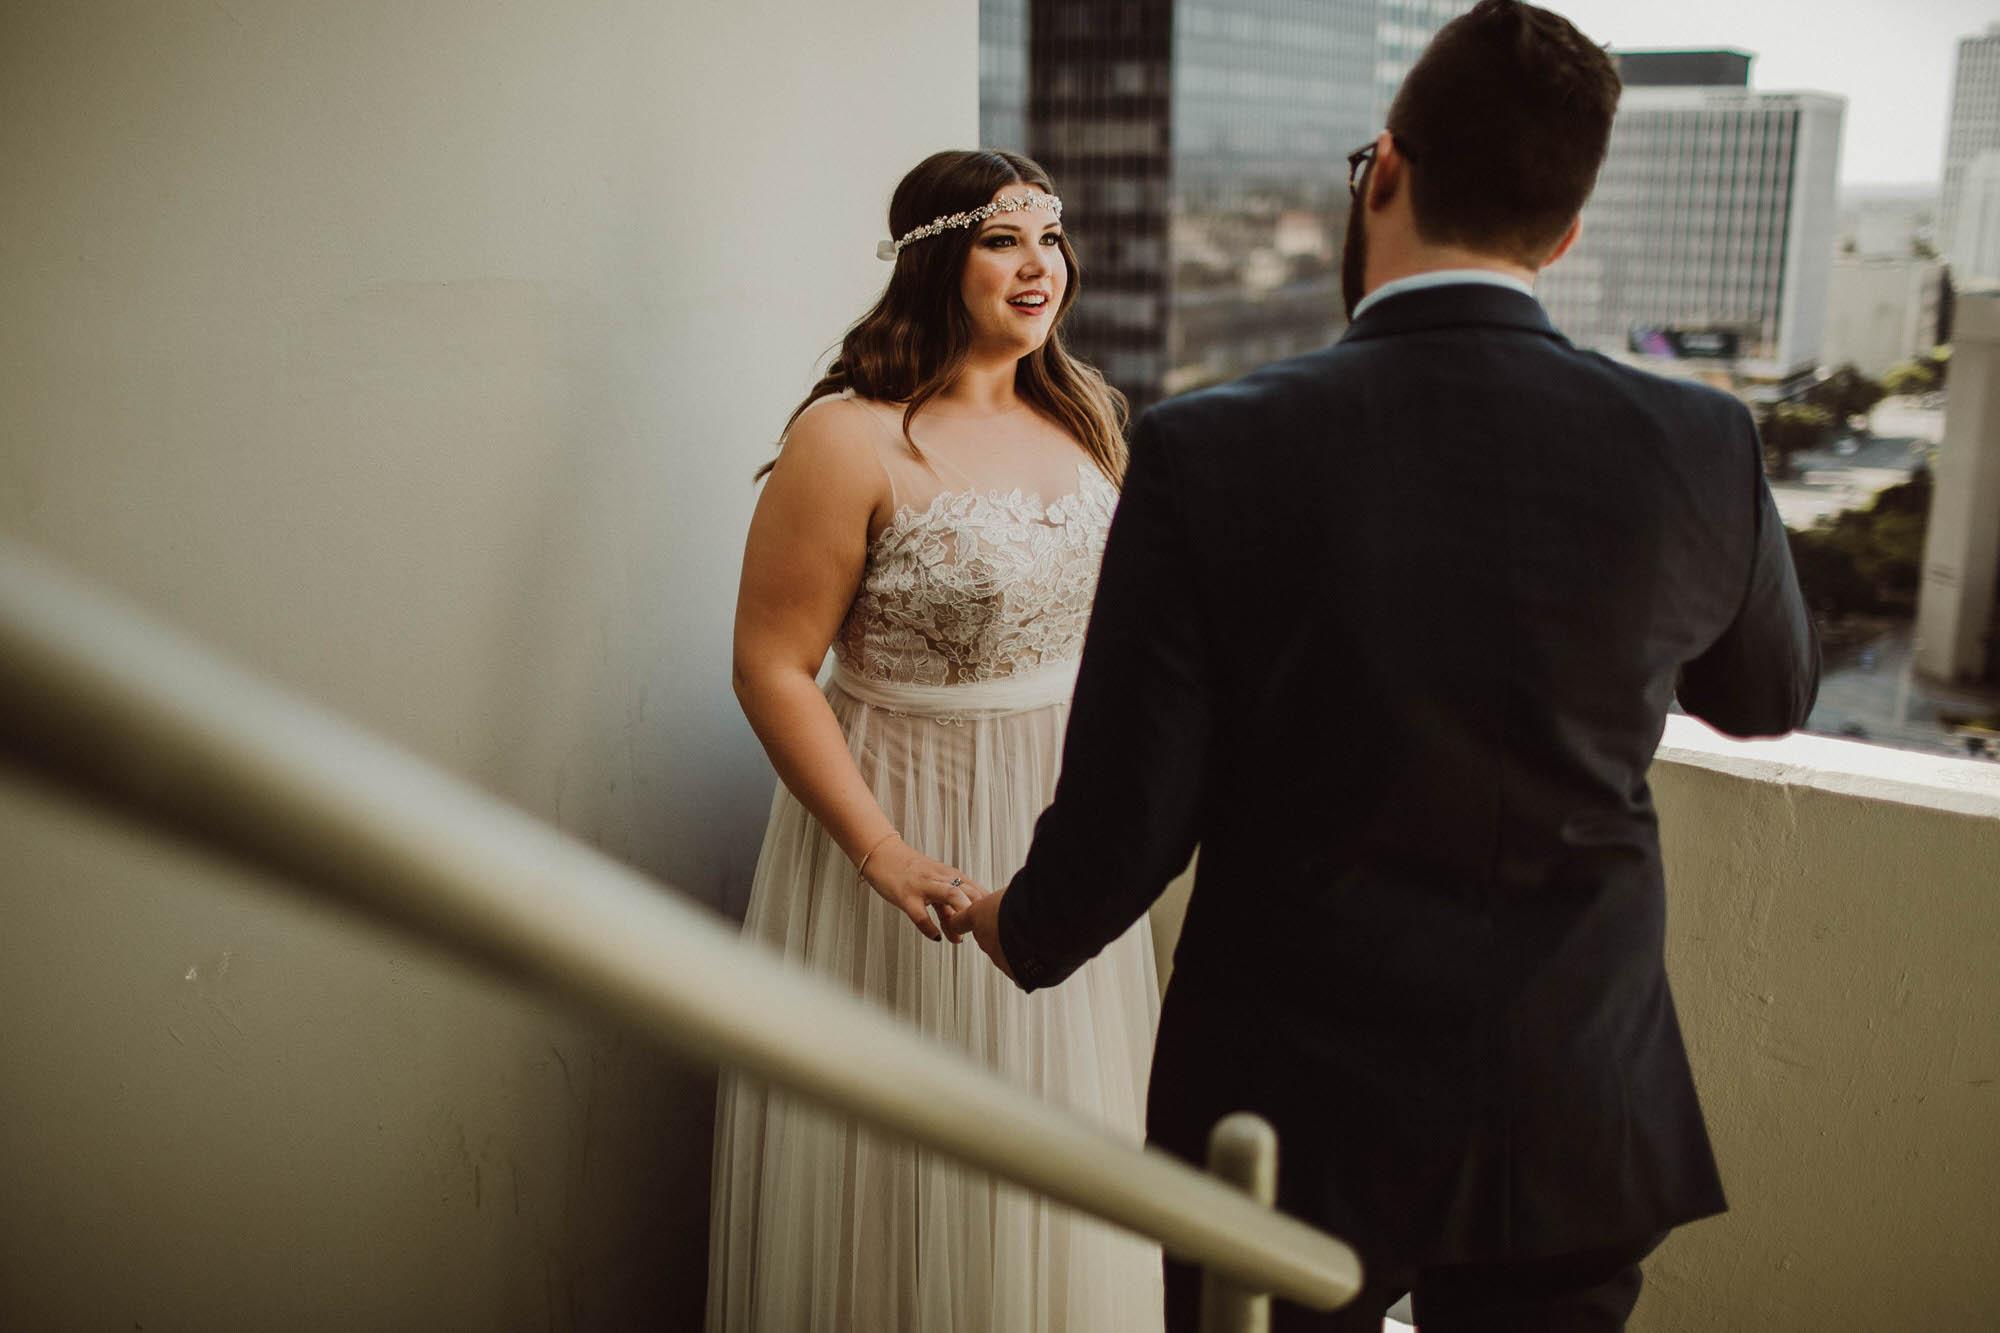 los-angeles-wedding-photographer-kristen-dylan-37.jpg